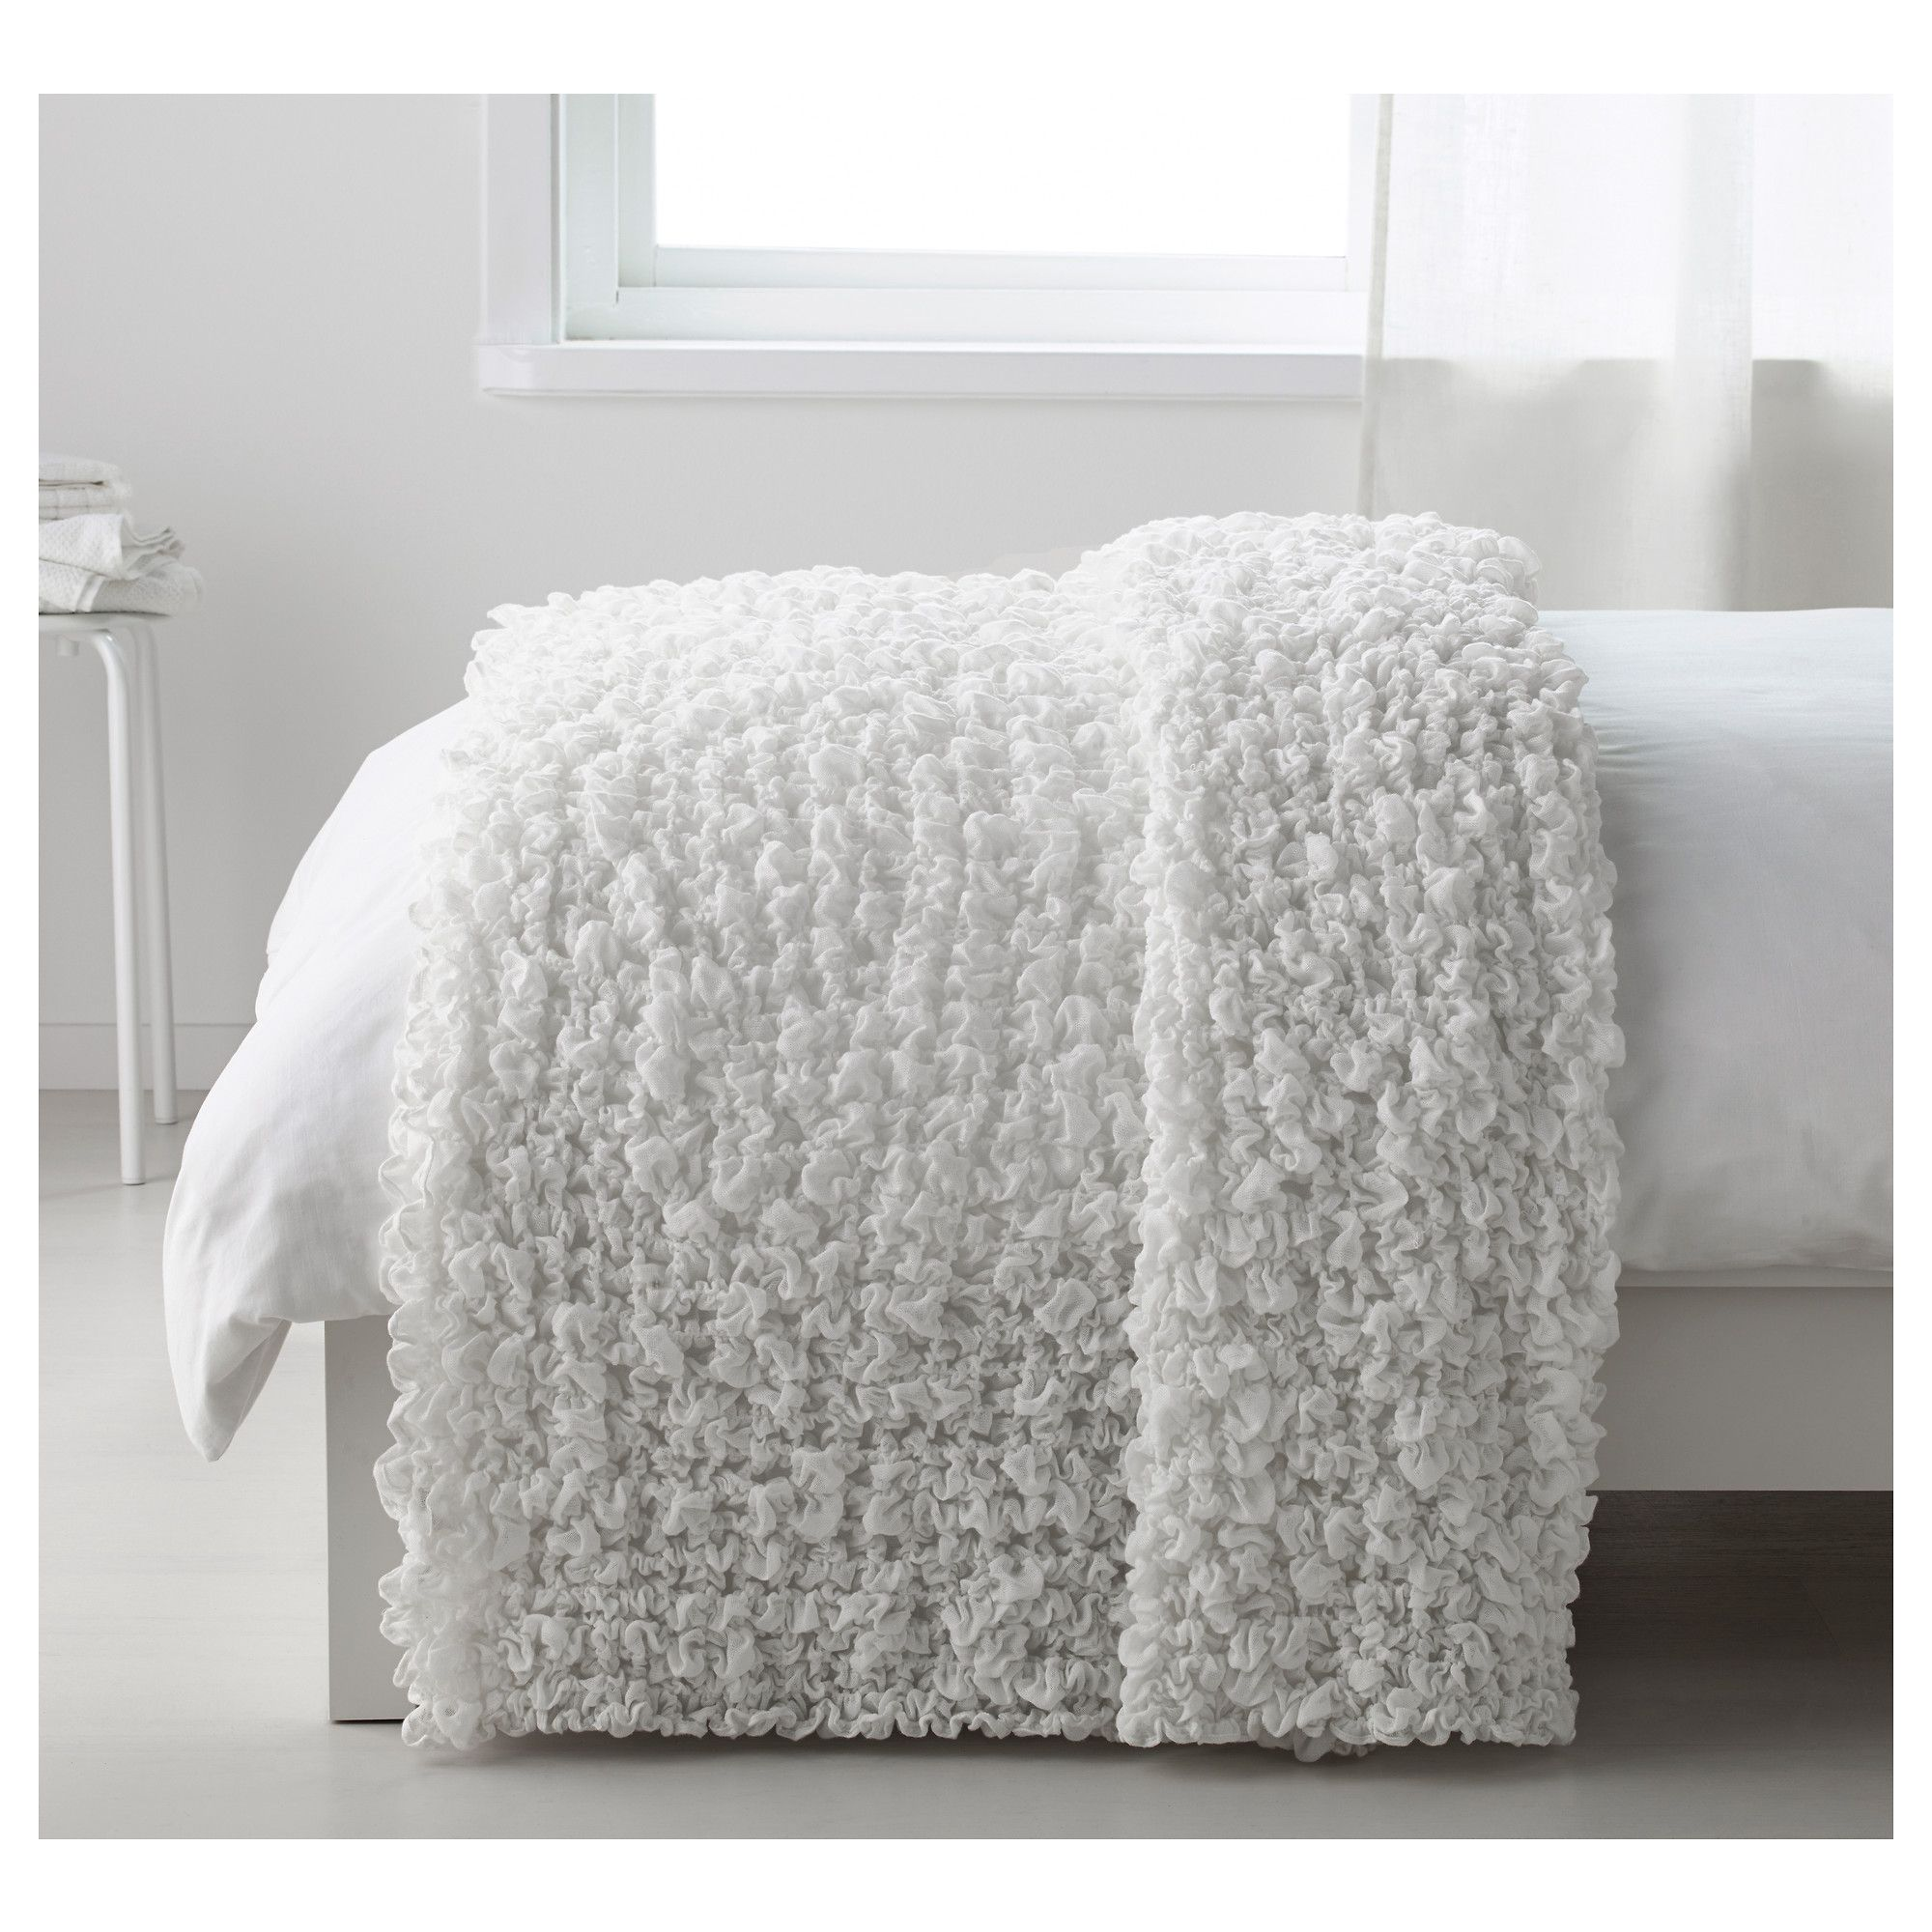 OFELIA Blanket White 130x170 cm | Bedrooms, Bedroom closets and Room